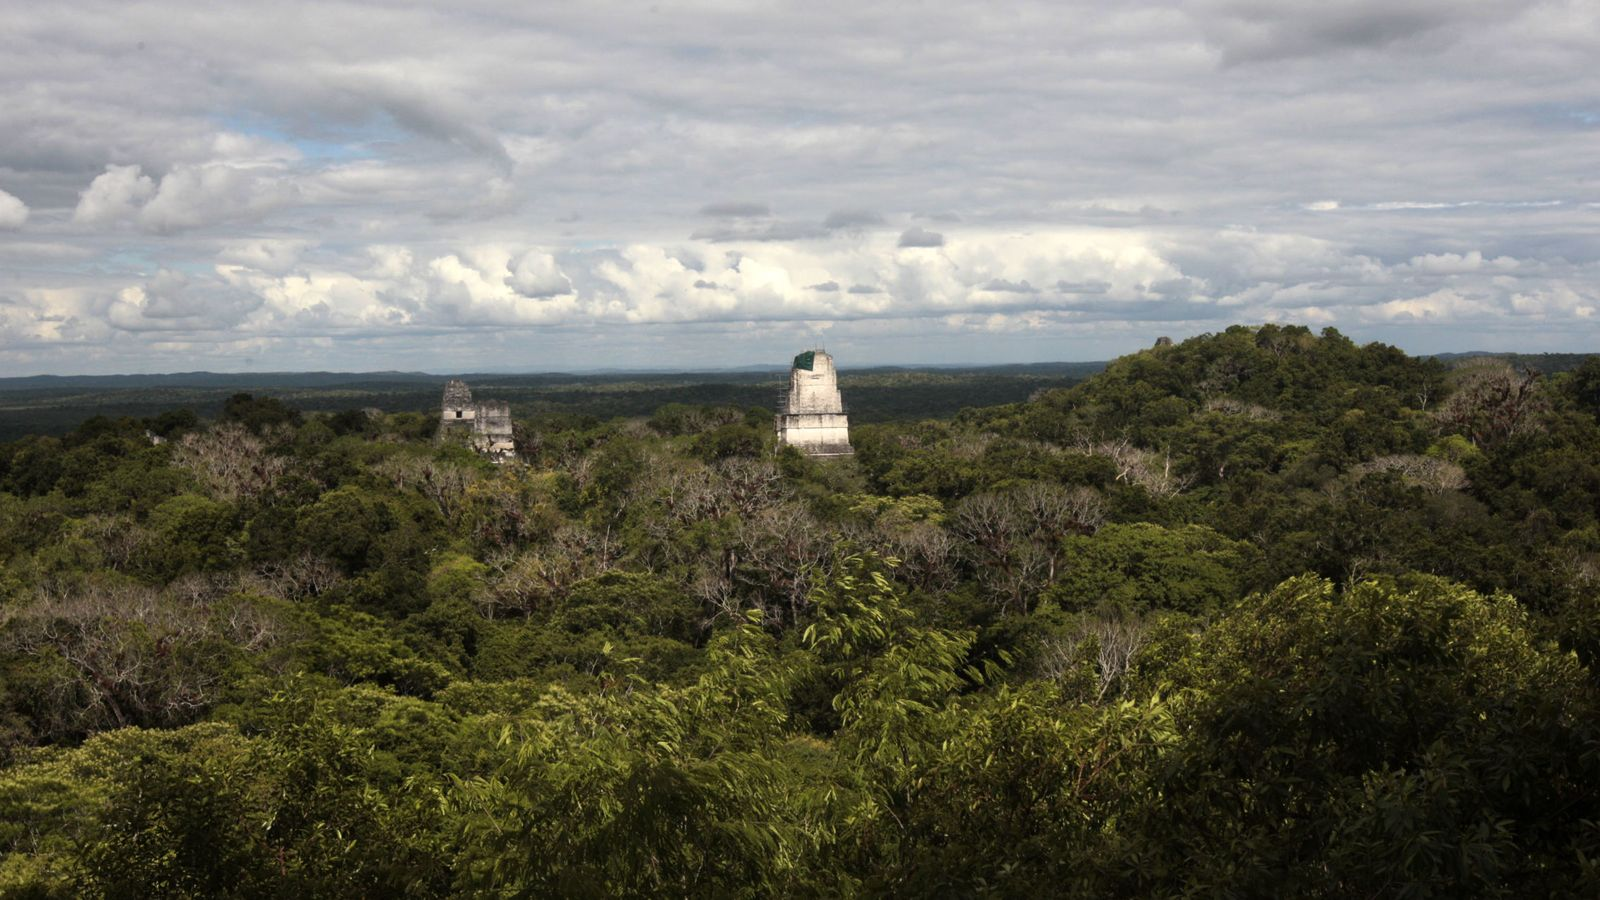 Foto: Vista del parque arqueológico Tikal en mitad de la selva petenera. Petén, Guatemala. (EFE)